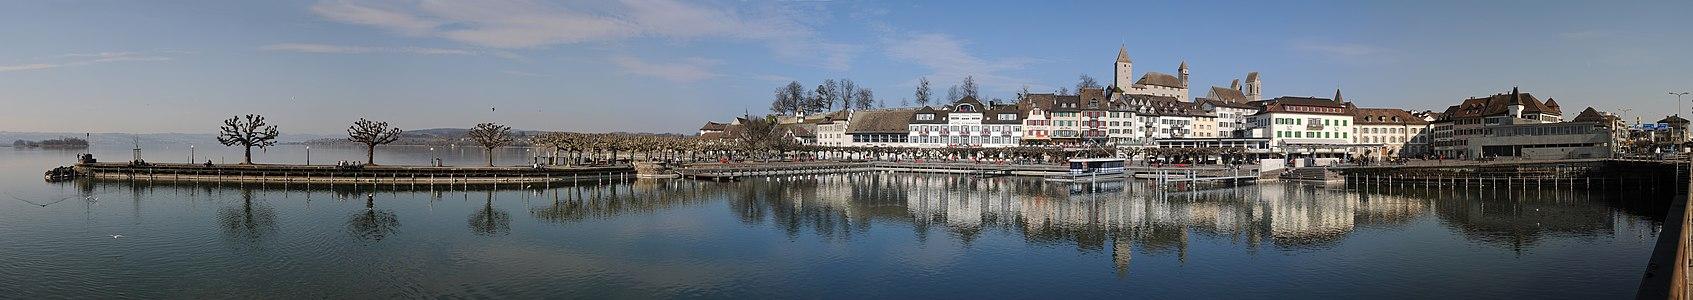 Rapperswil SG, Switzerland